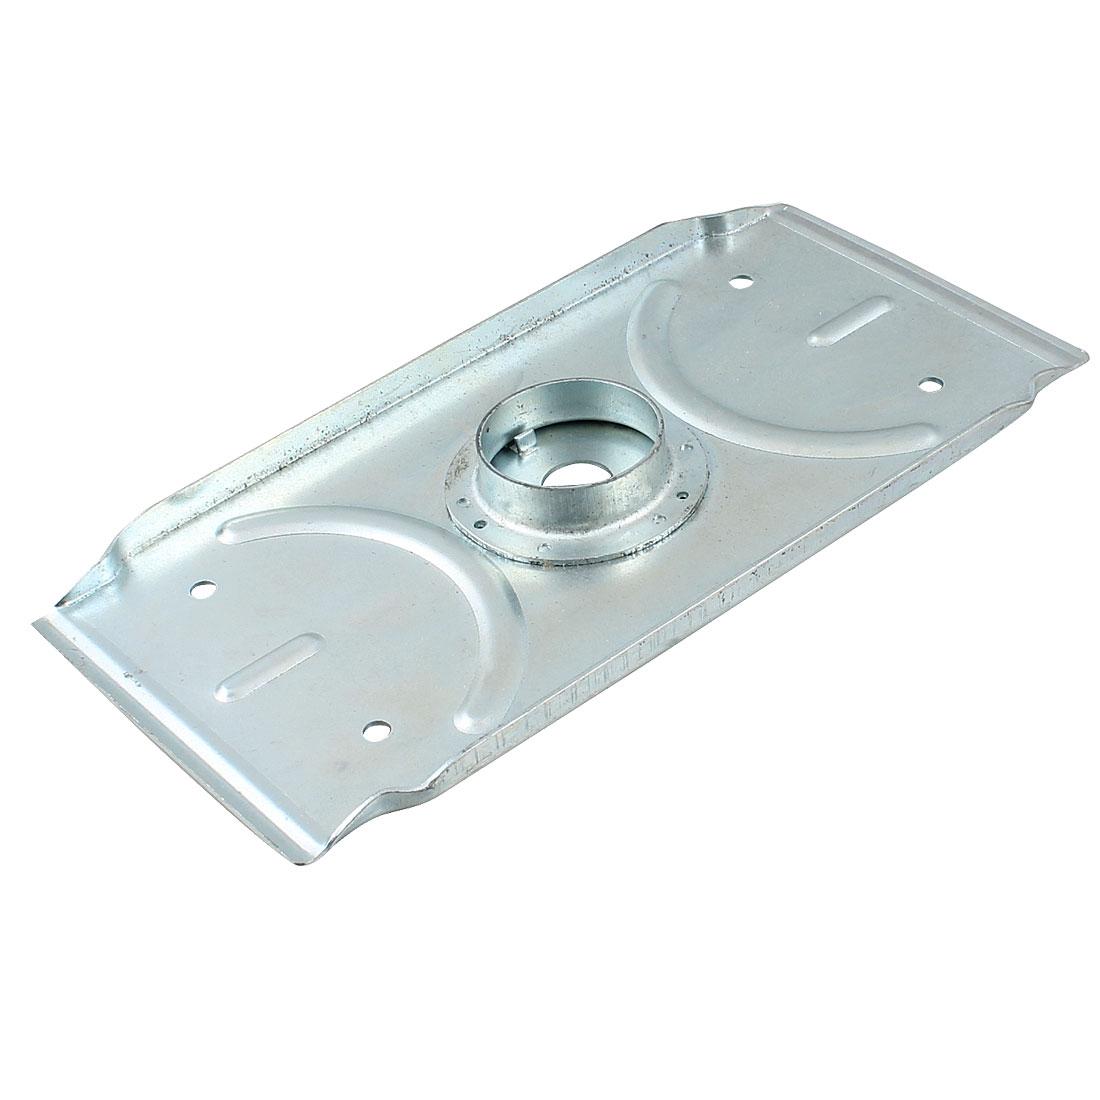 Metal Base Plate for Makita 9035 Dongcheng 93x185mm Orbital Sander